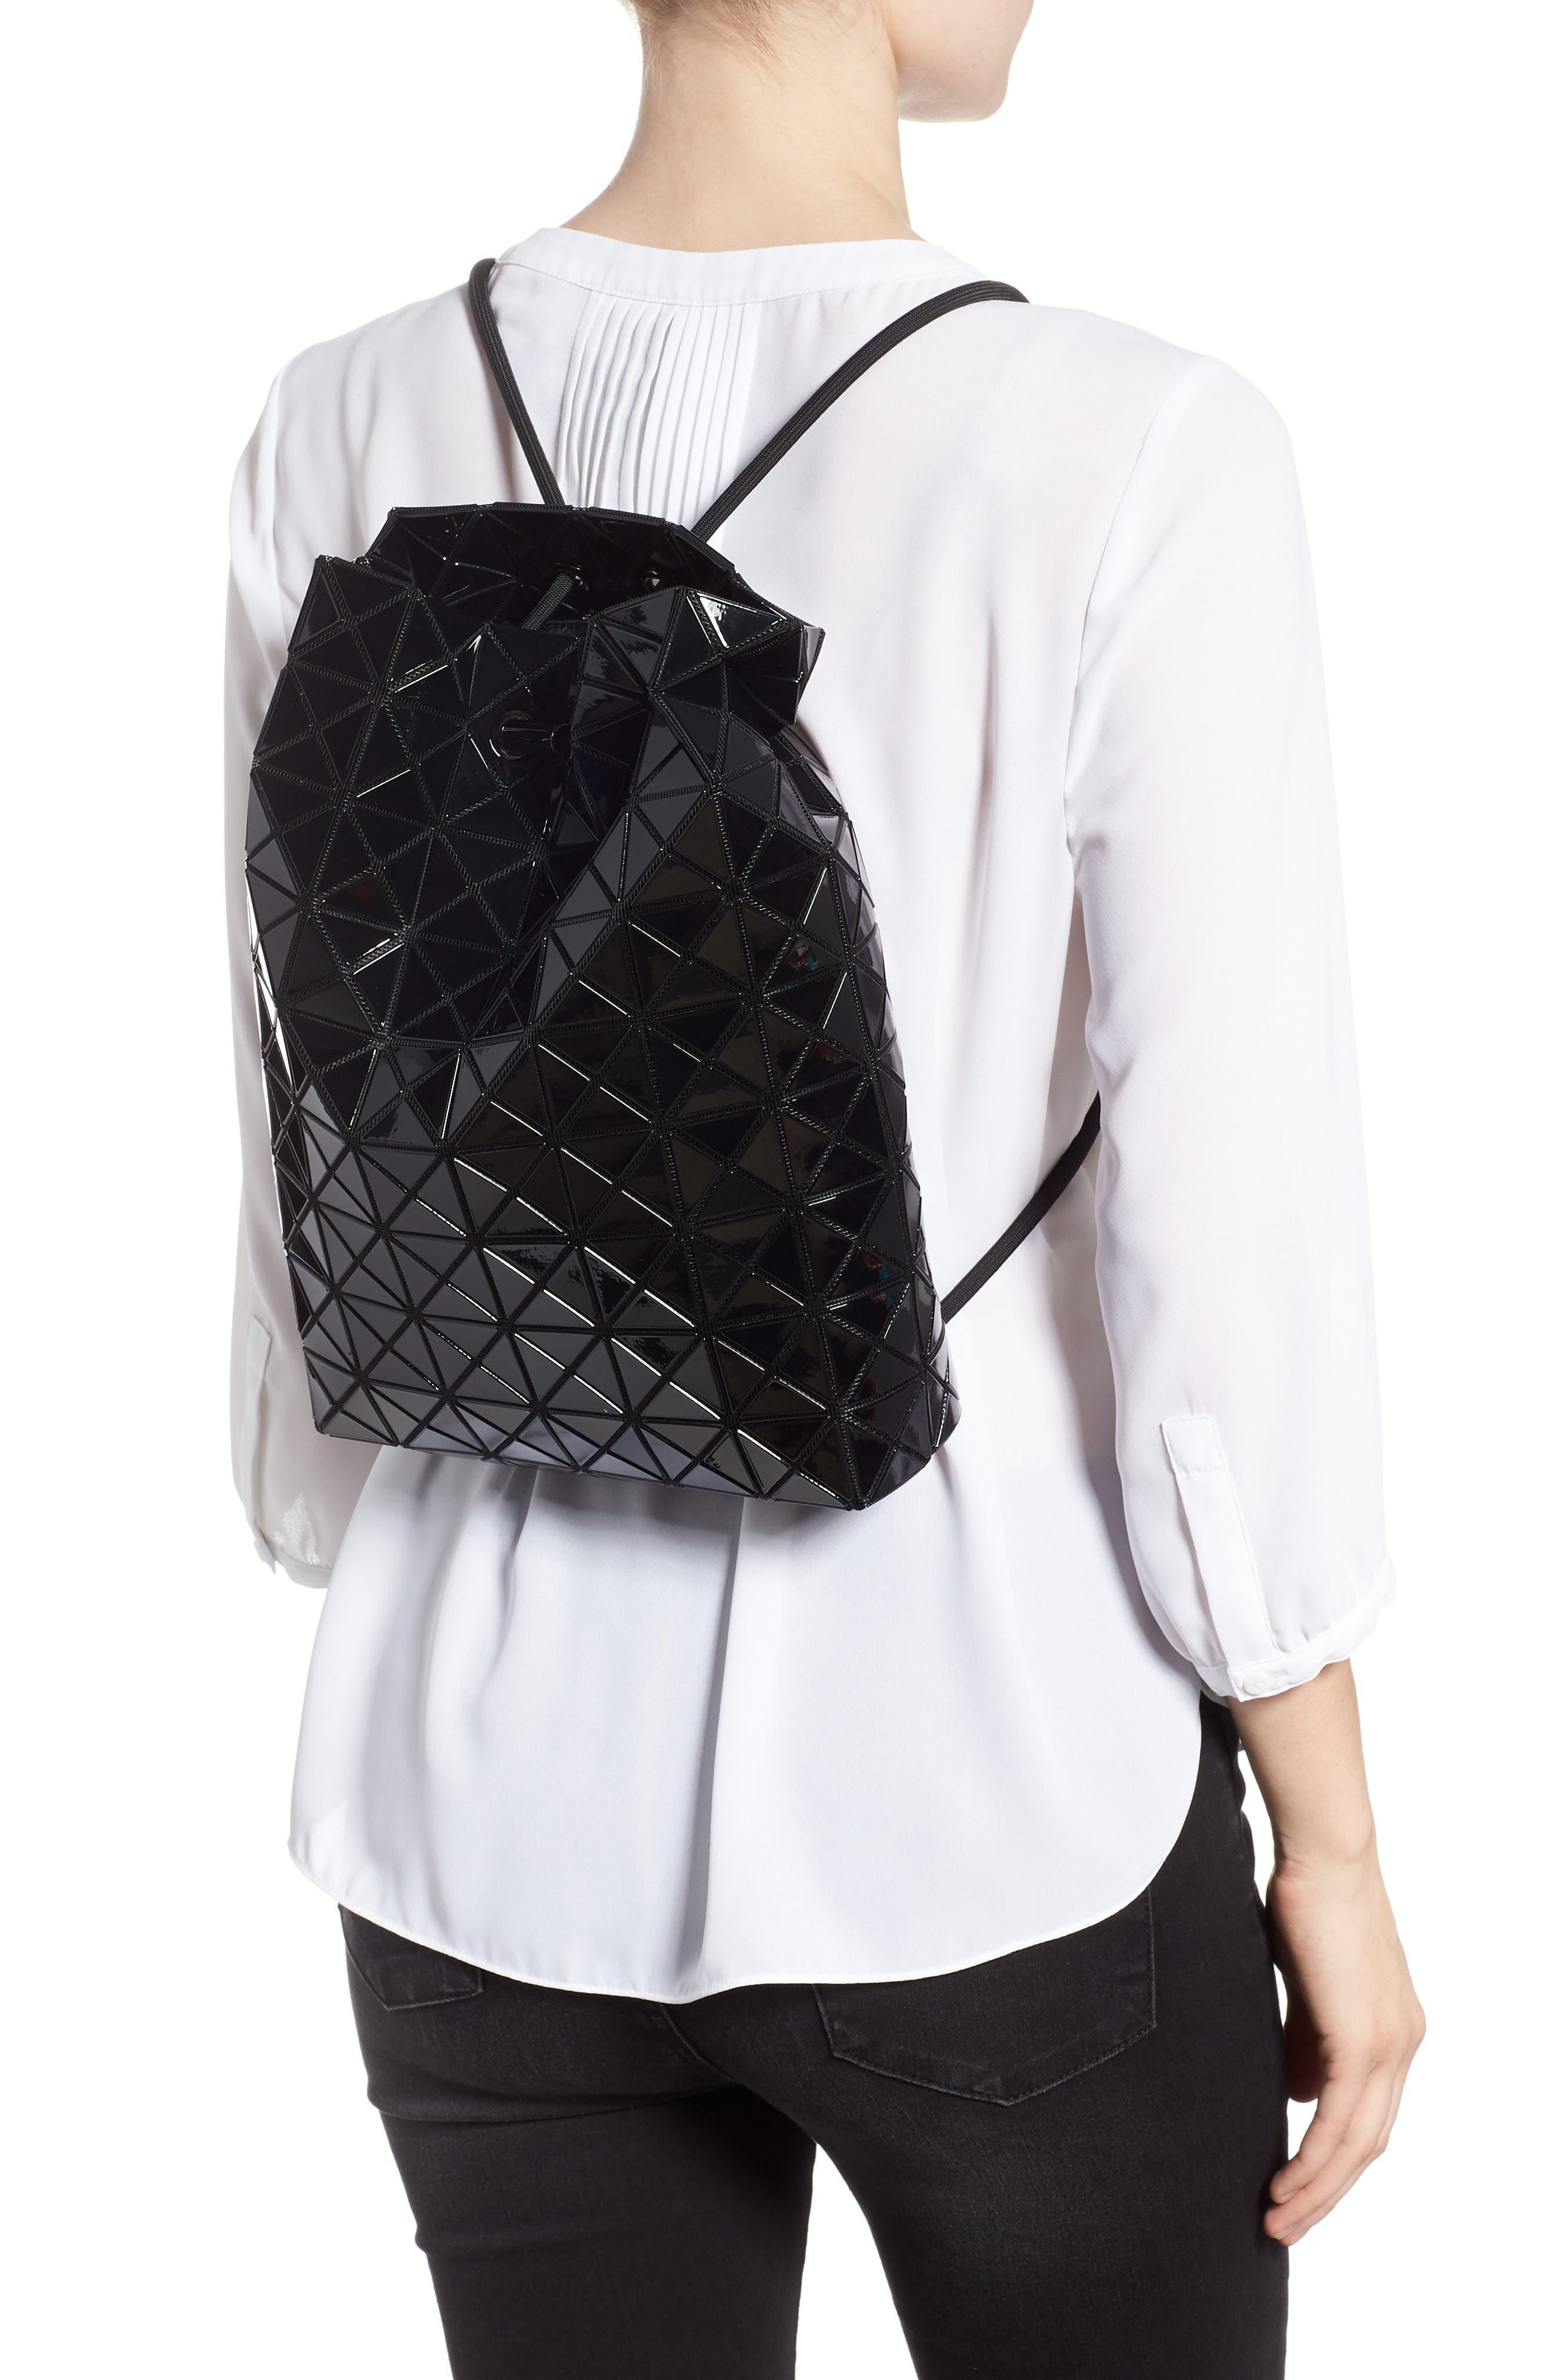 Wring Flat Backpack,                             Alternate thumbnail 2, color,                             BLACK